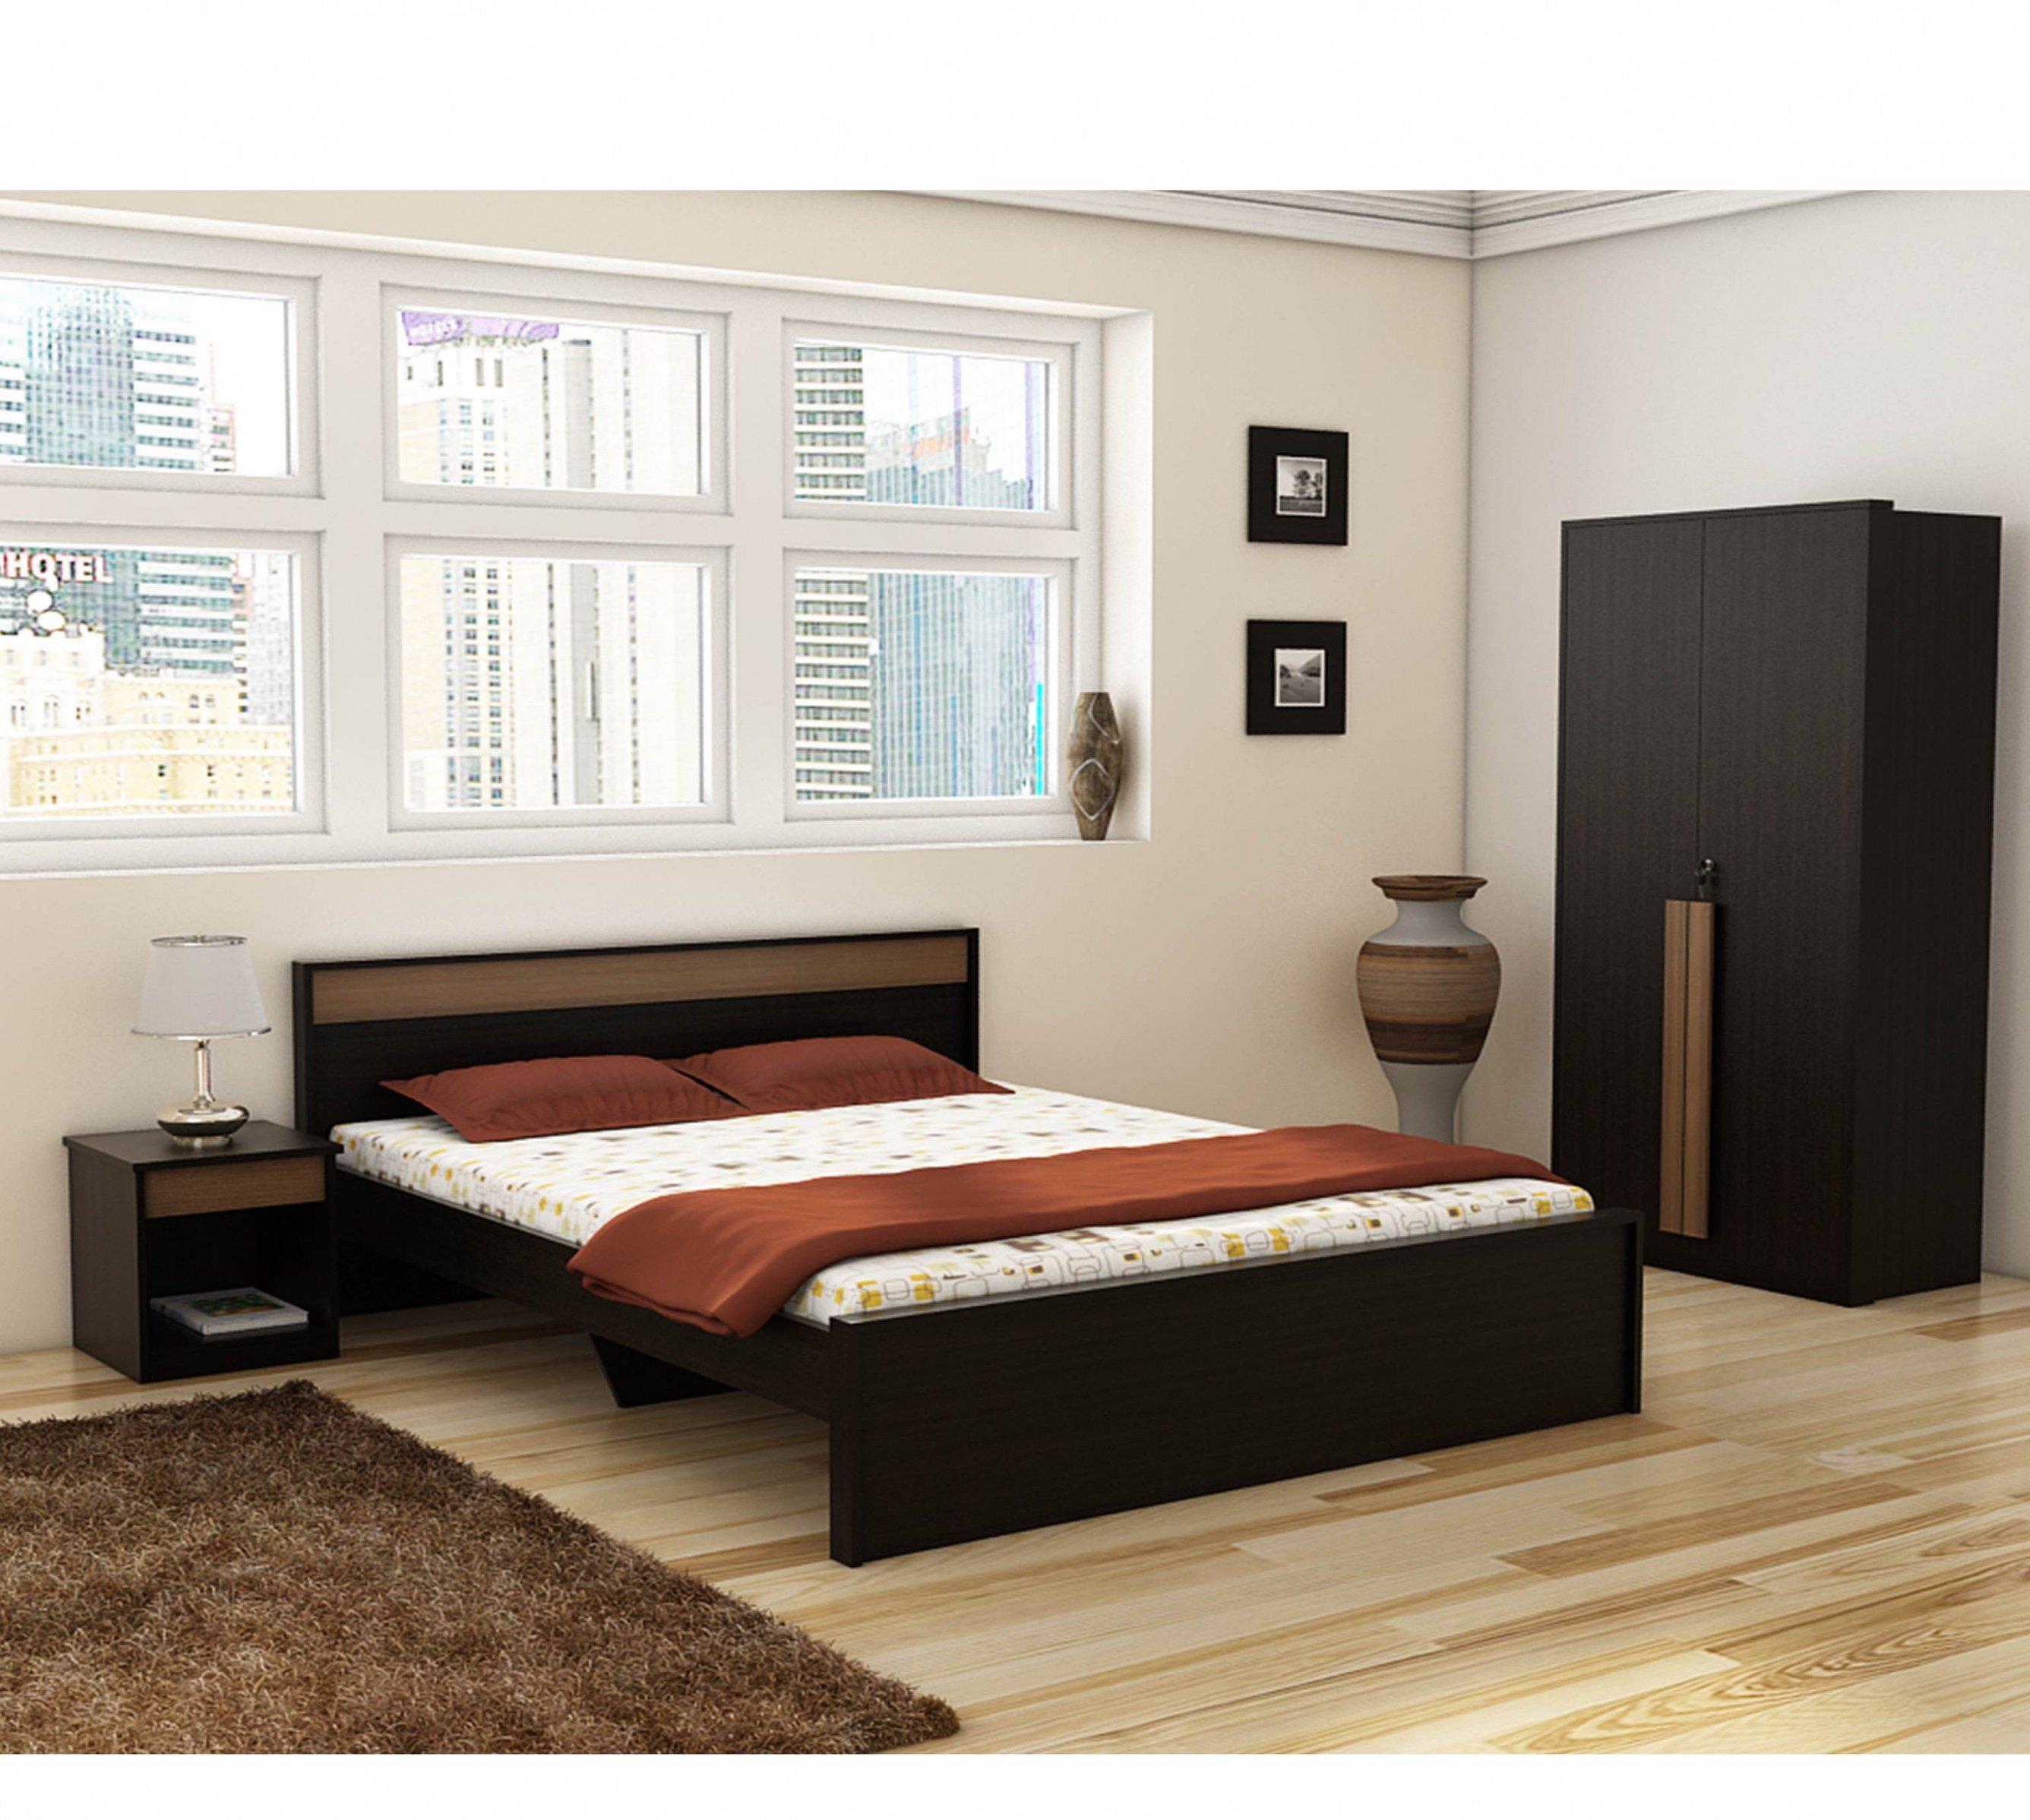 Ikea White Bedroom Furniture Elegant Low Beds Ikea White Bedroom Furniture Sets Ikea White Hemnes